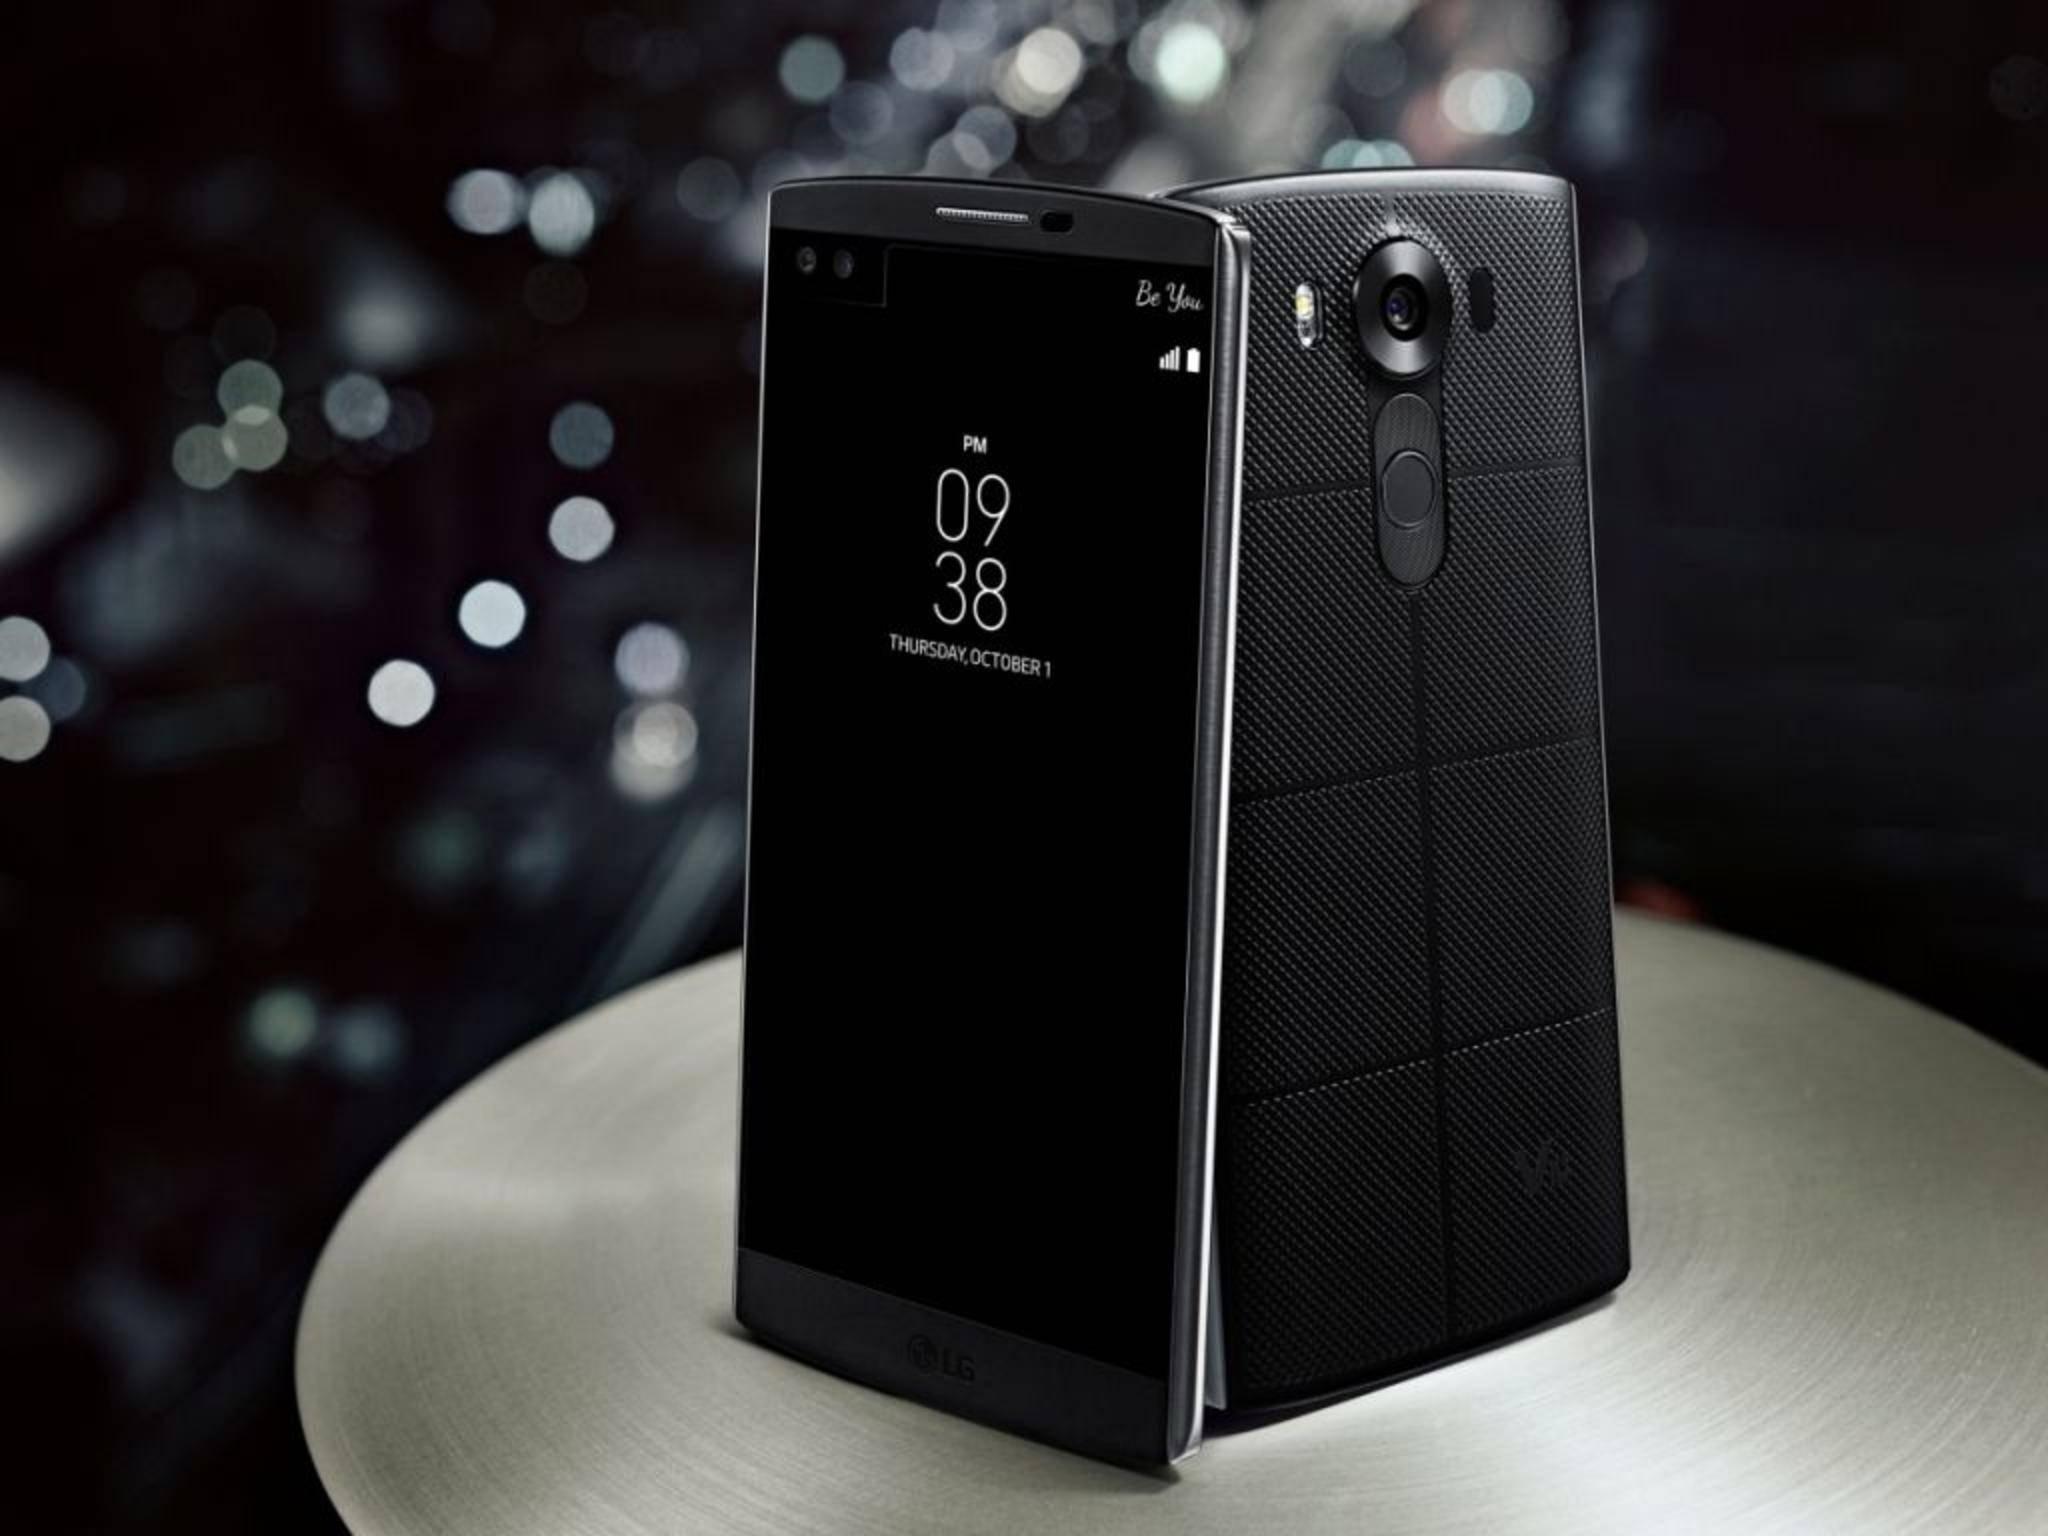 Das LG V10 bekommt mit dem V20 einen Nachfolger.